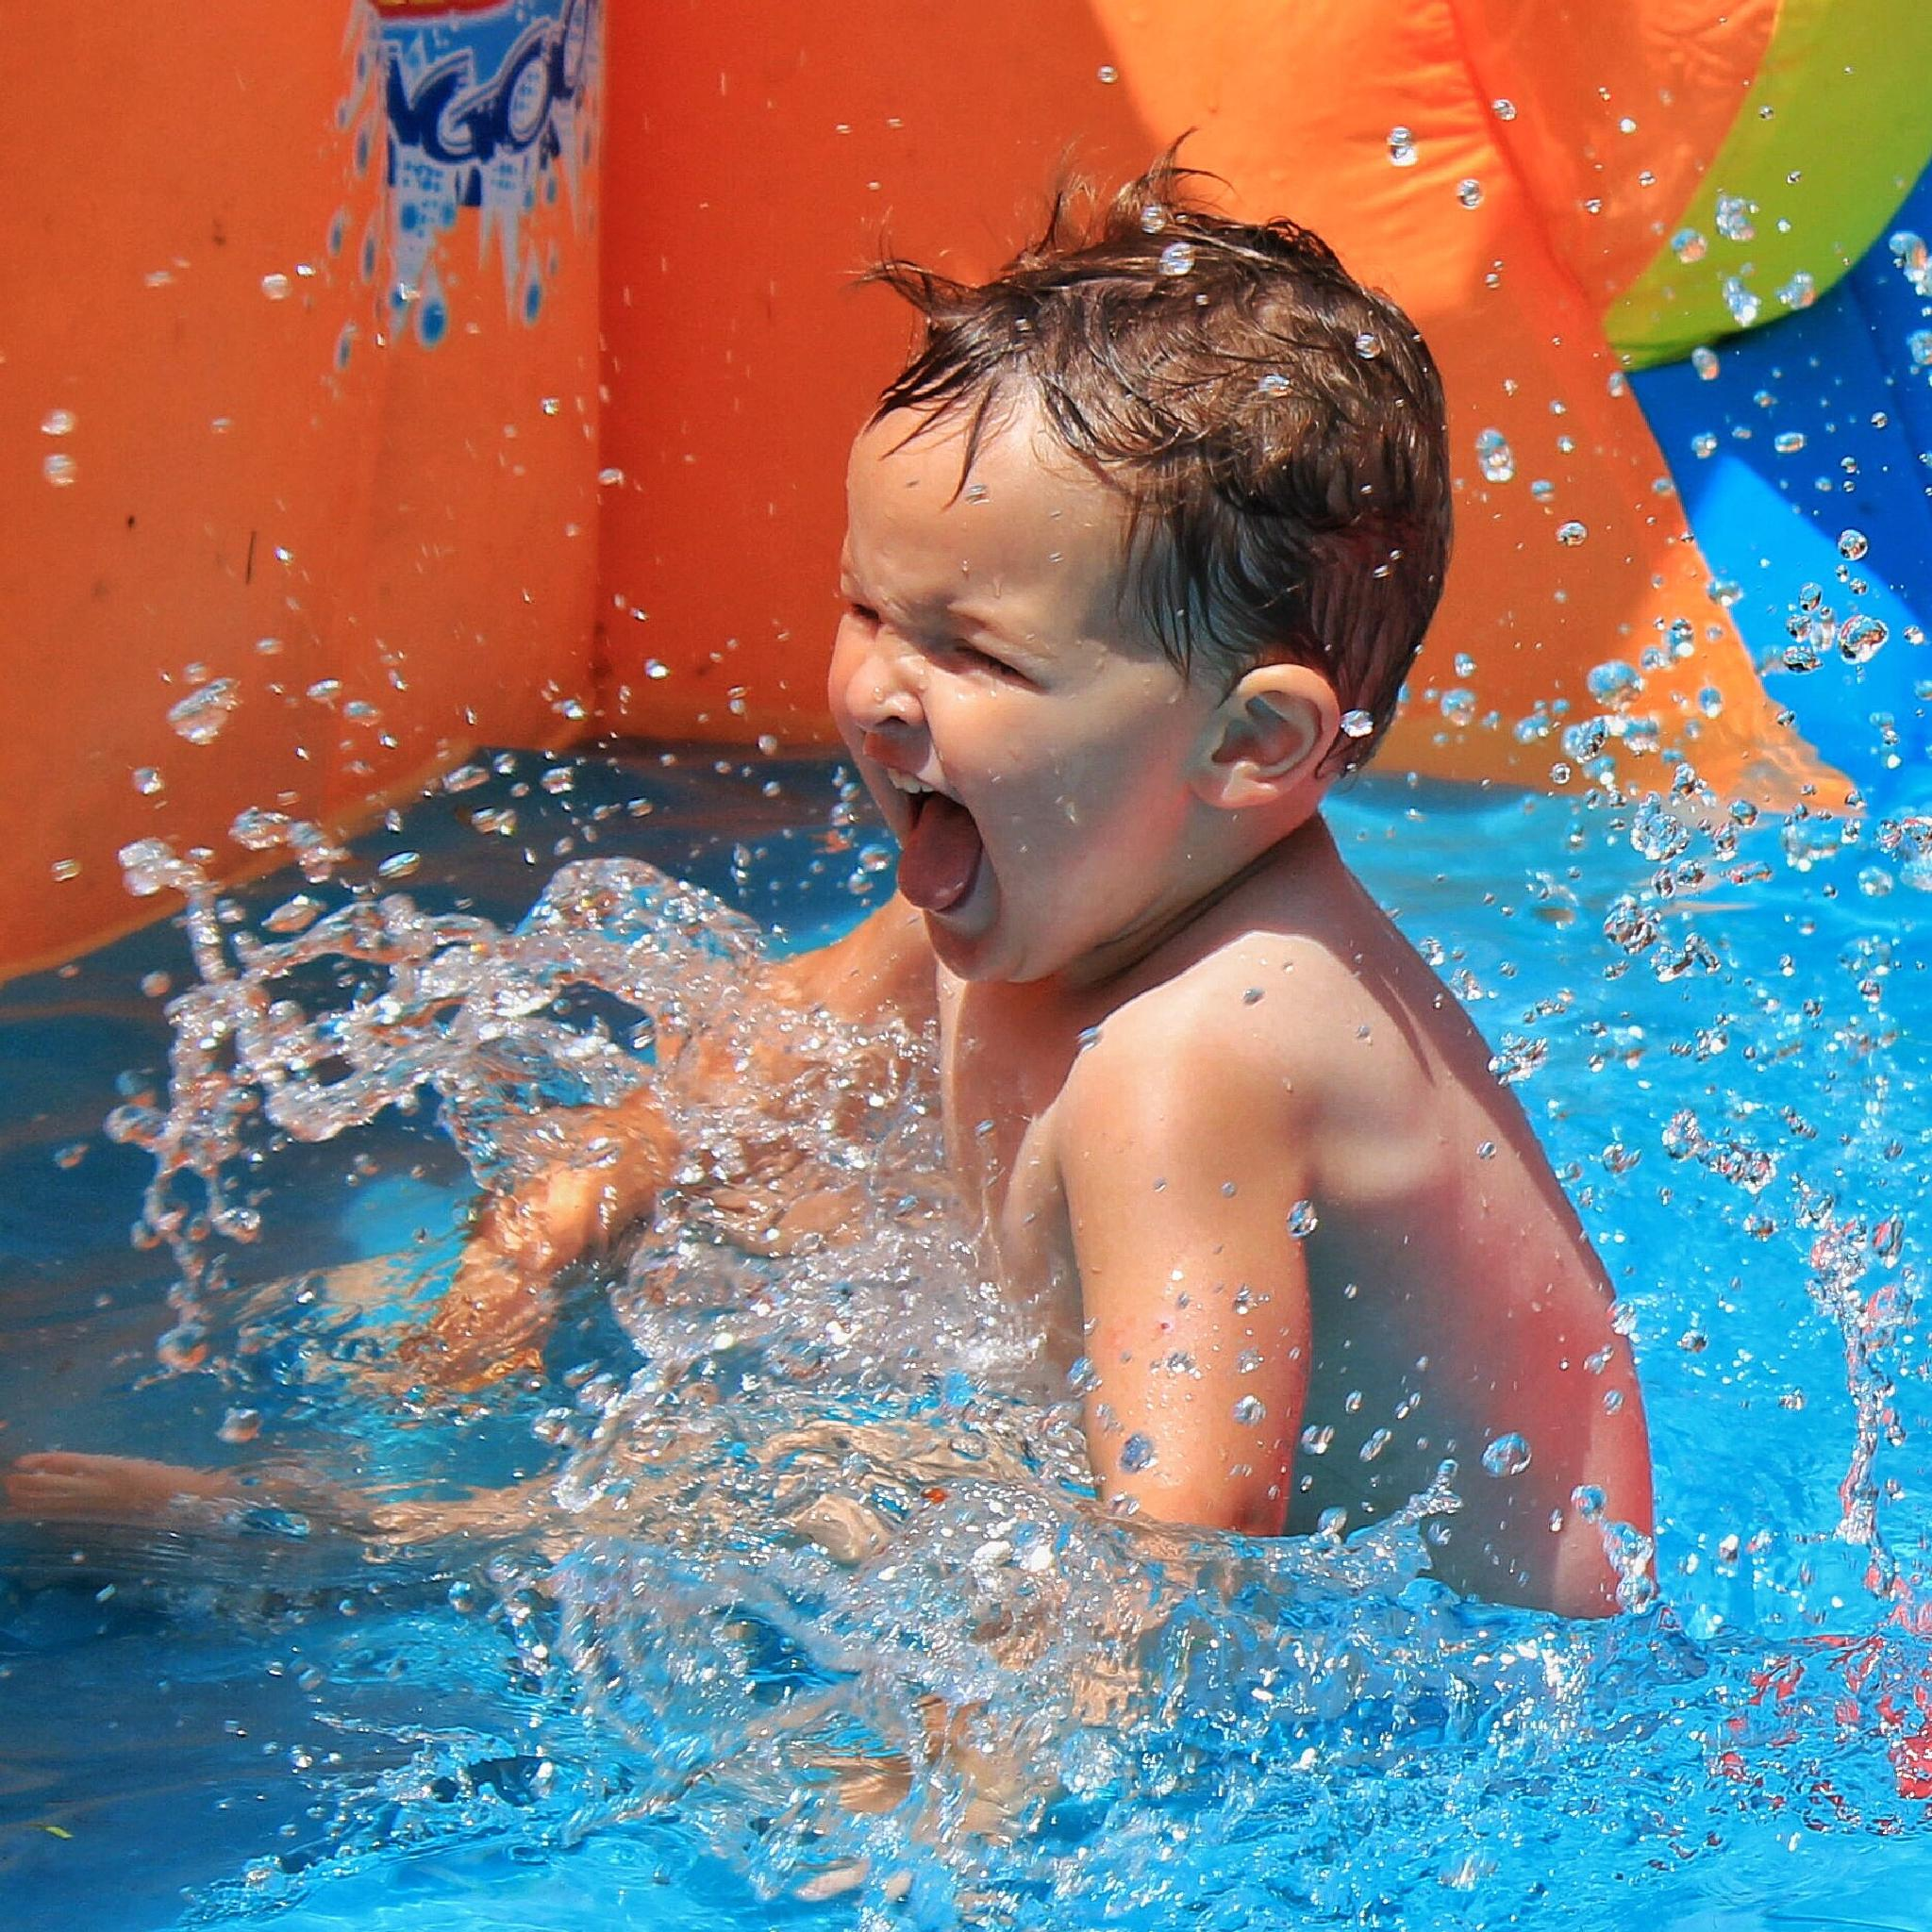 Splashing Fun 2 by shaunarwhitaker